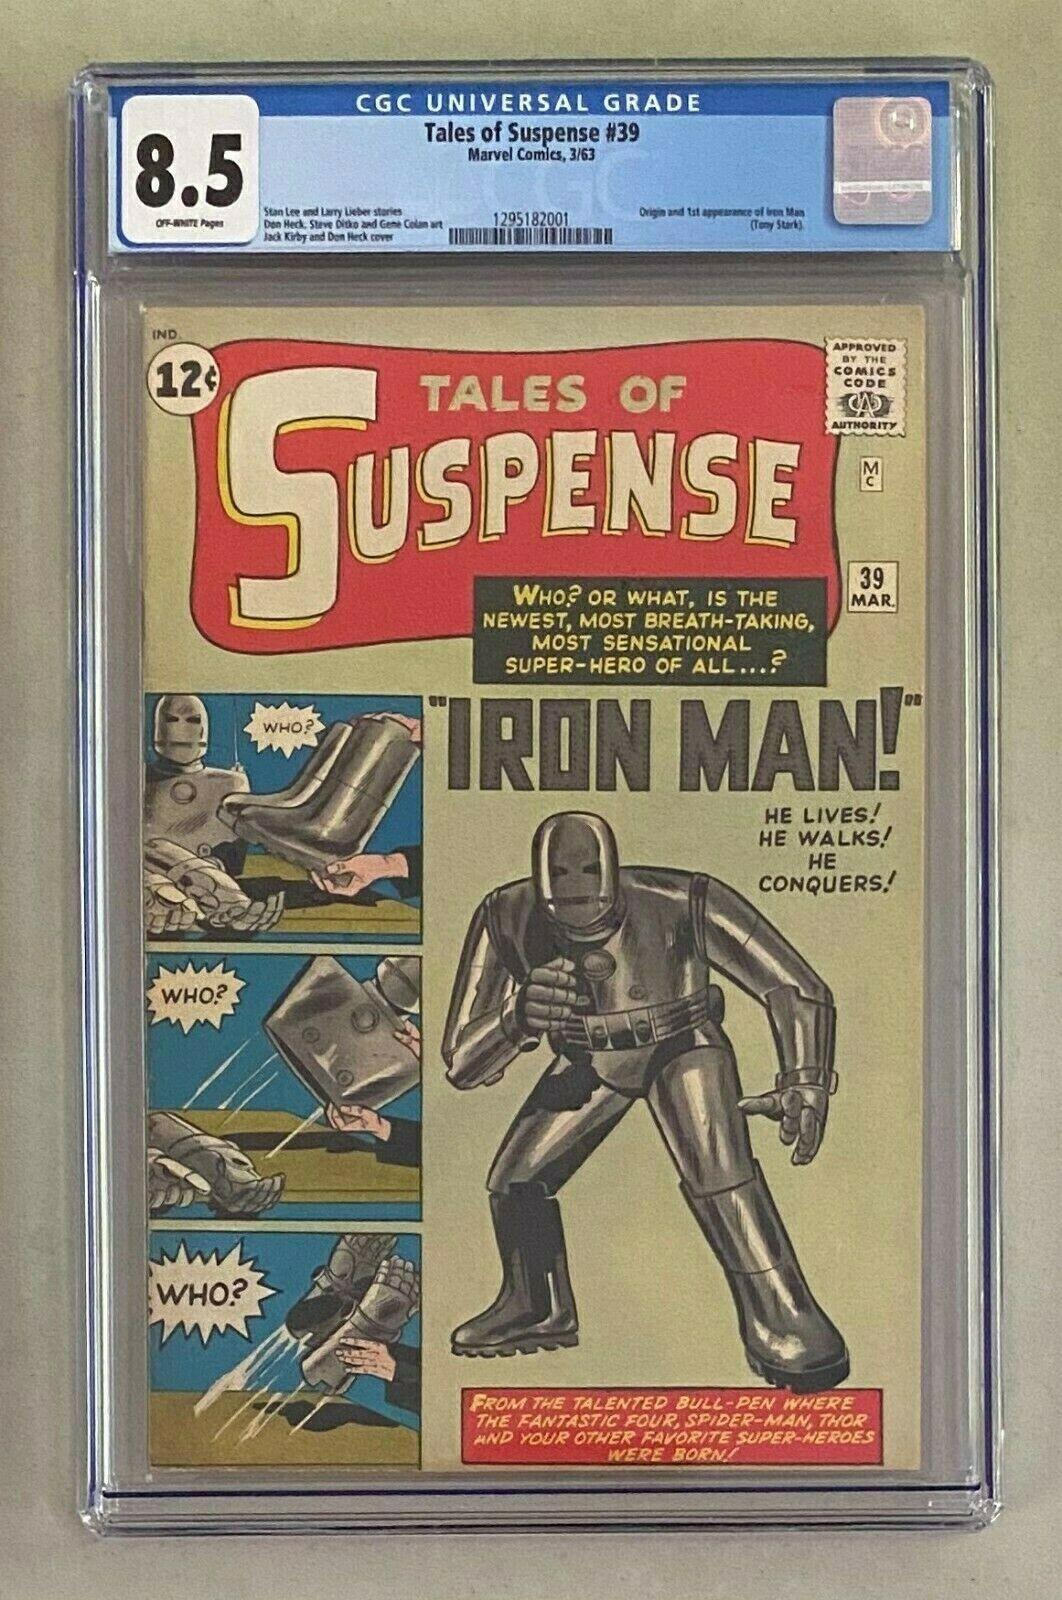 TALES OF SUSPENSE #39 Marvel Comics 1963 CGC 8.5 Origin & 1st Appearance